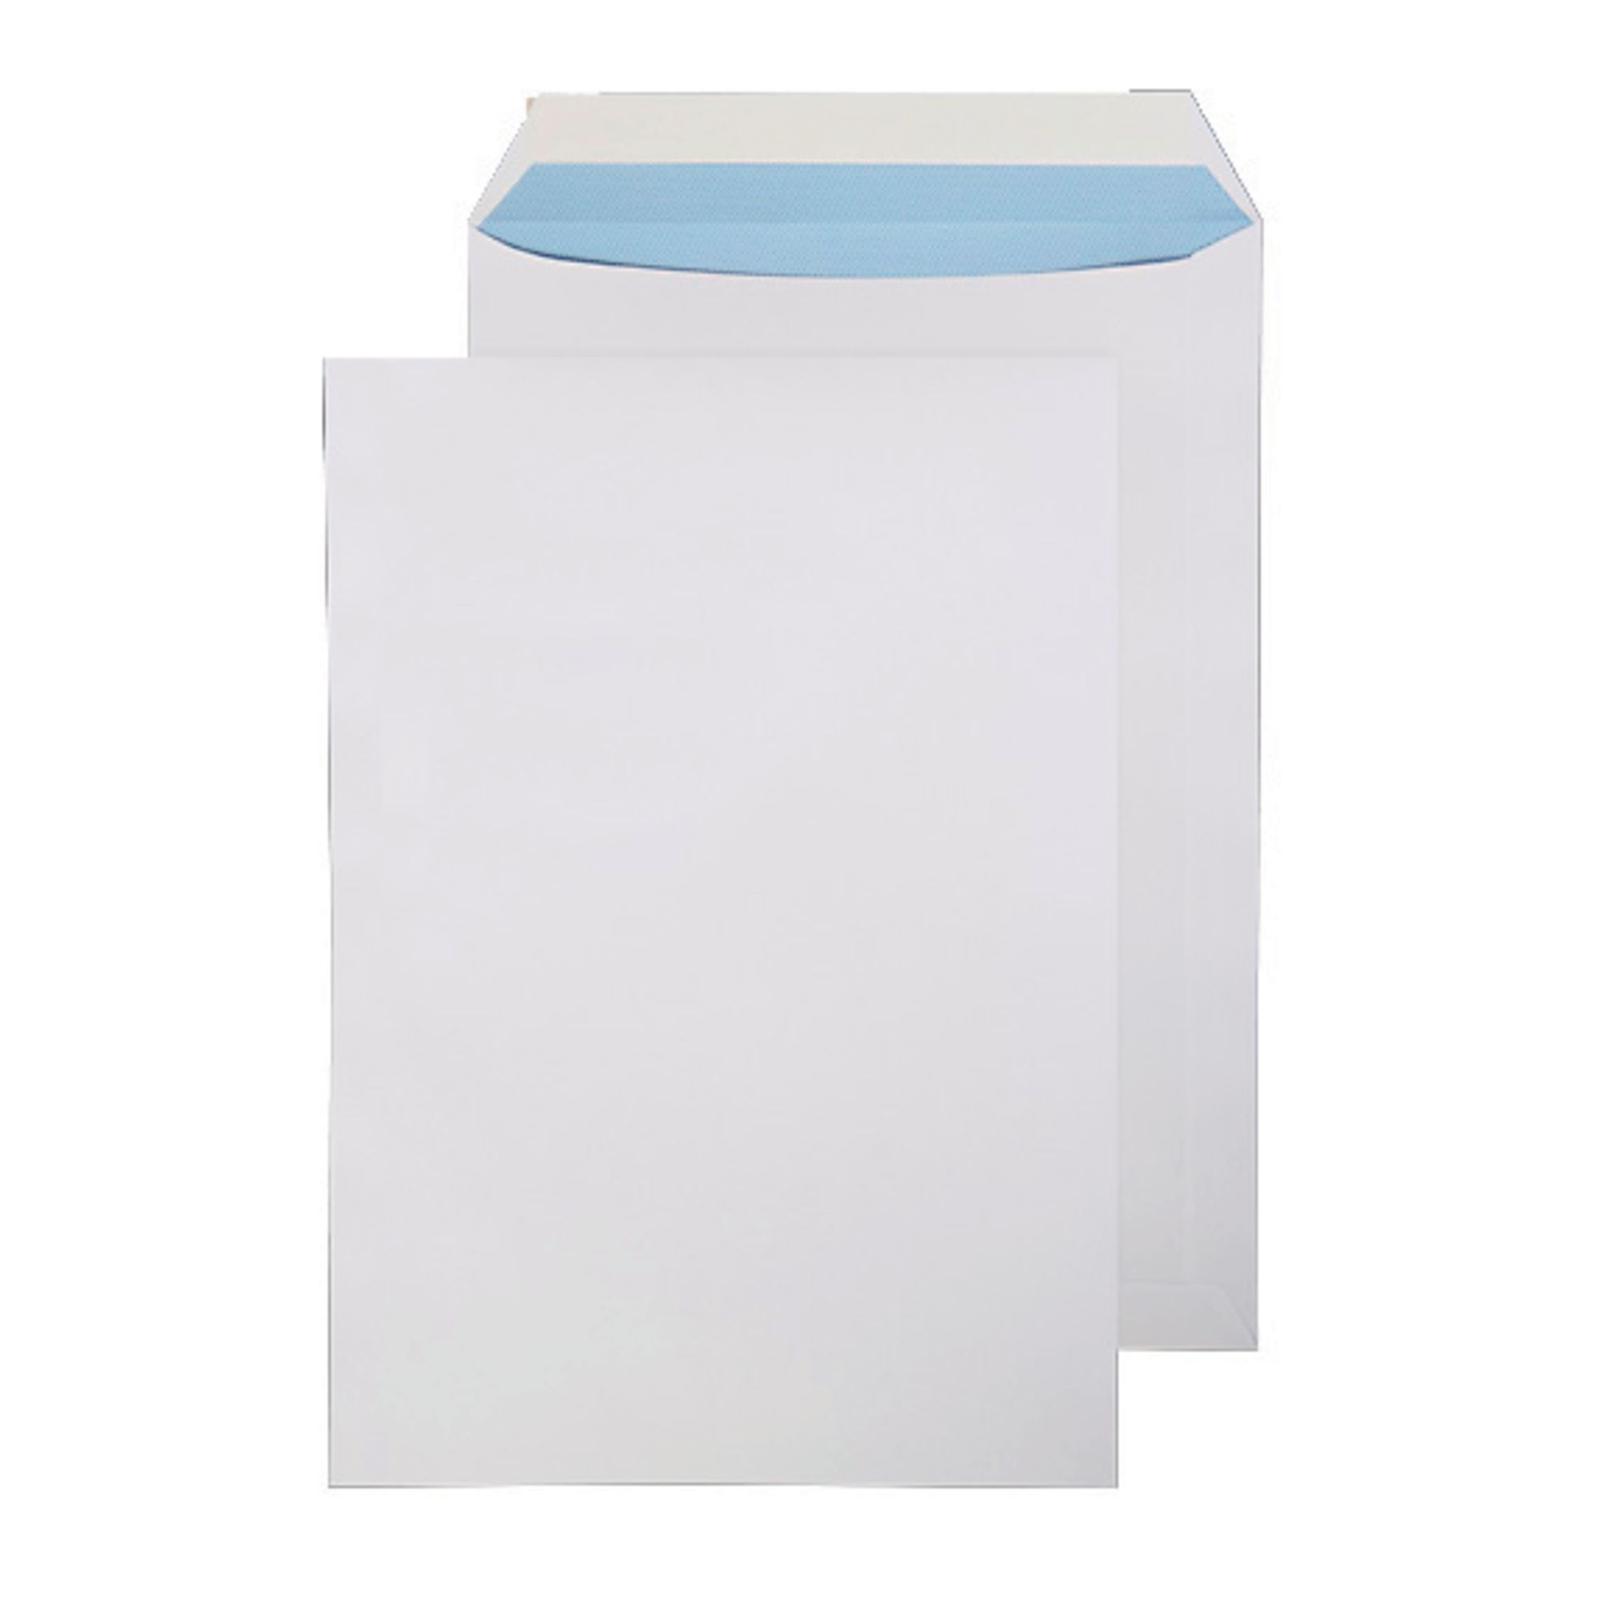 C4 White Peel and Seal Pocket Envelopes - Box of 250